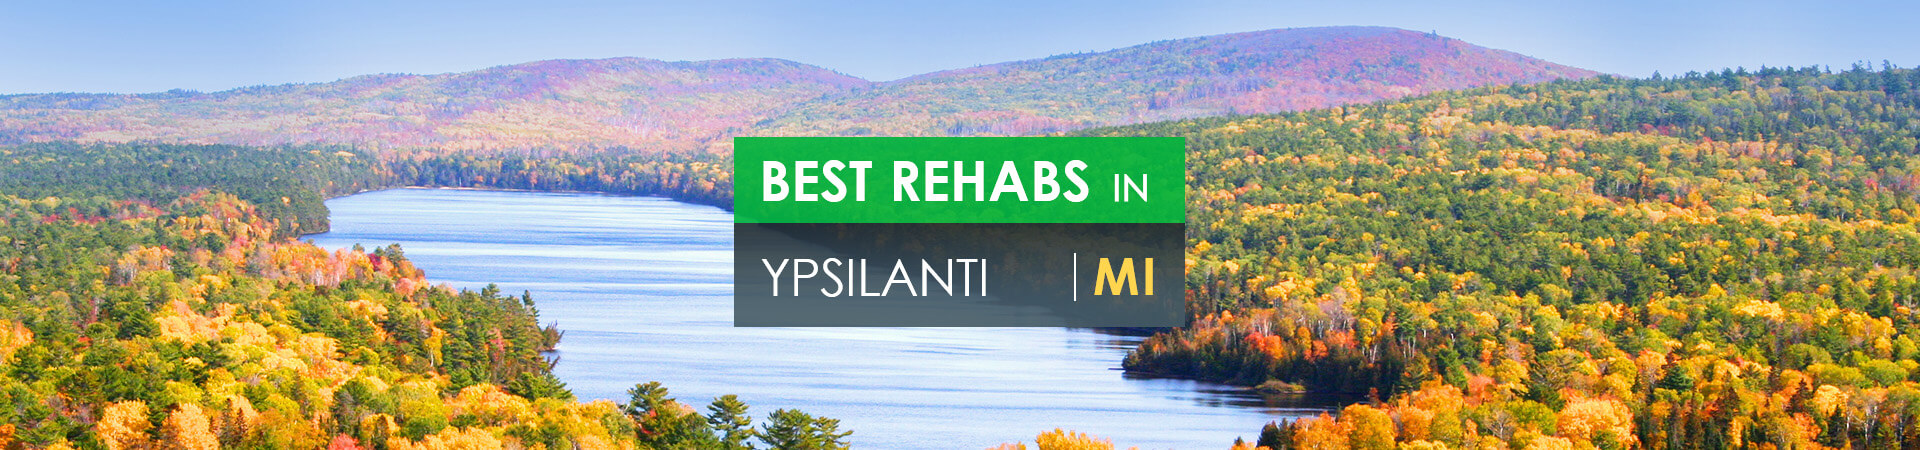 Best rehabs in Ypsilanti, MI